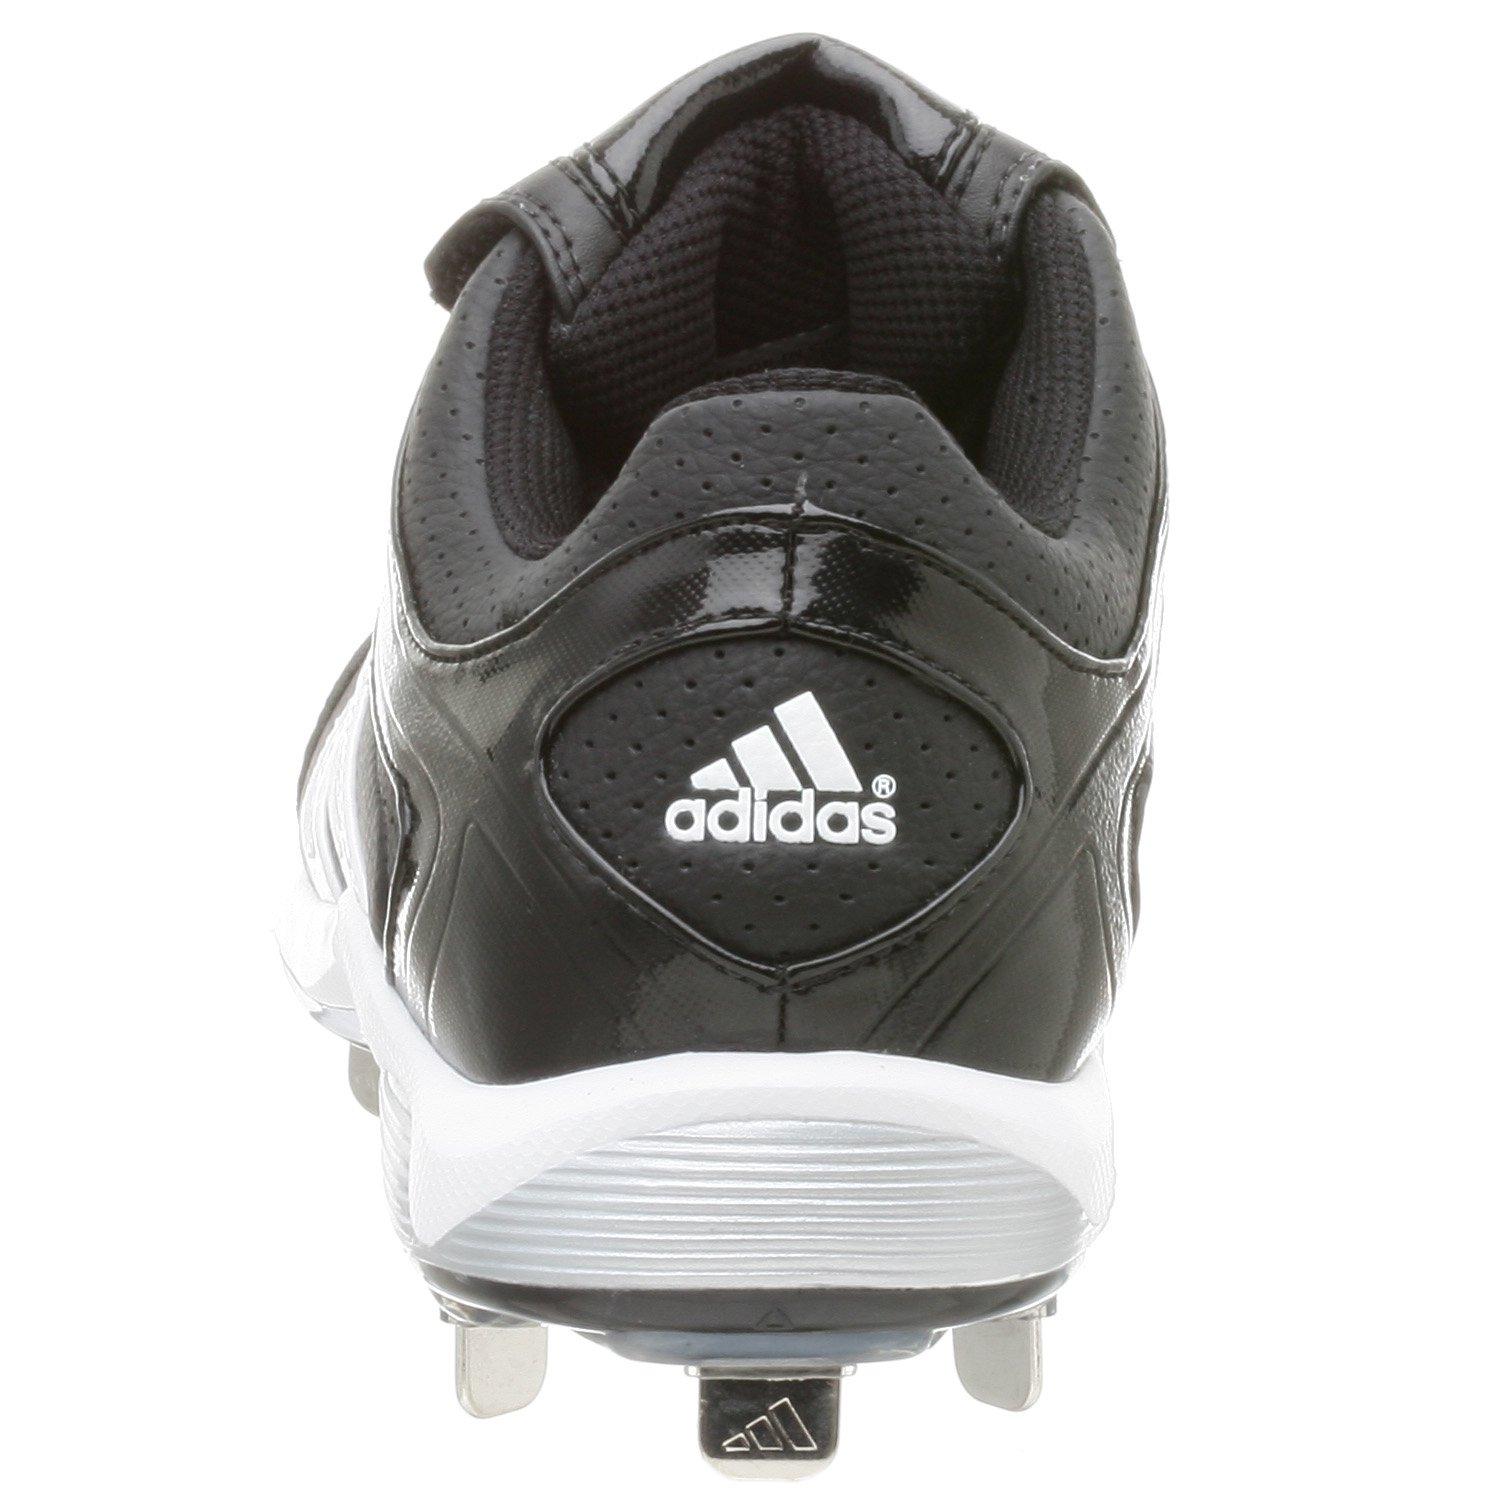 adidas Men's Diamond King Low Baseball Shoe,Blk/Runwht/Metsil,9.5 M by adidas (Image #3)